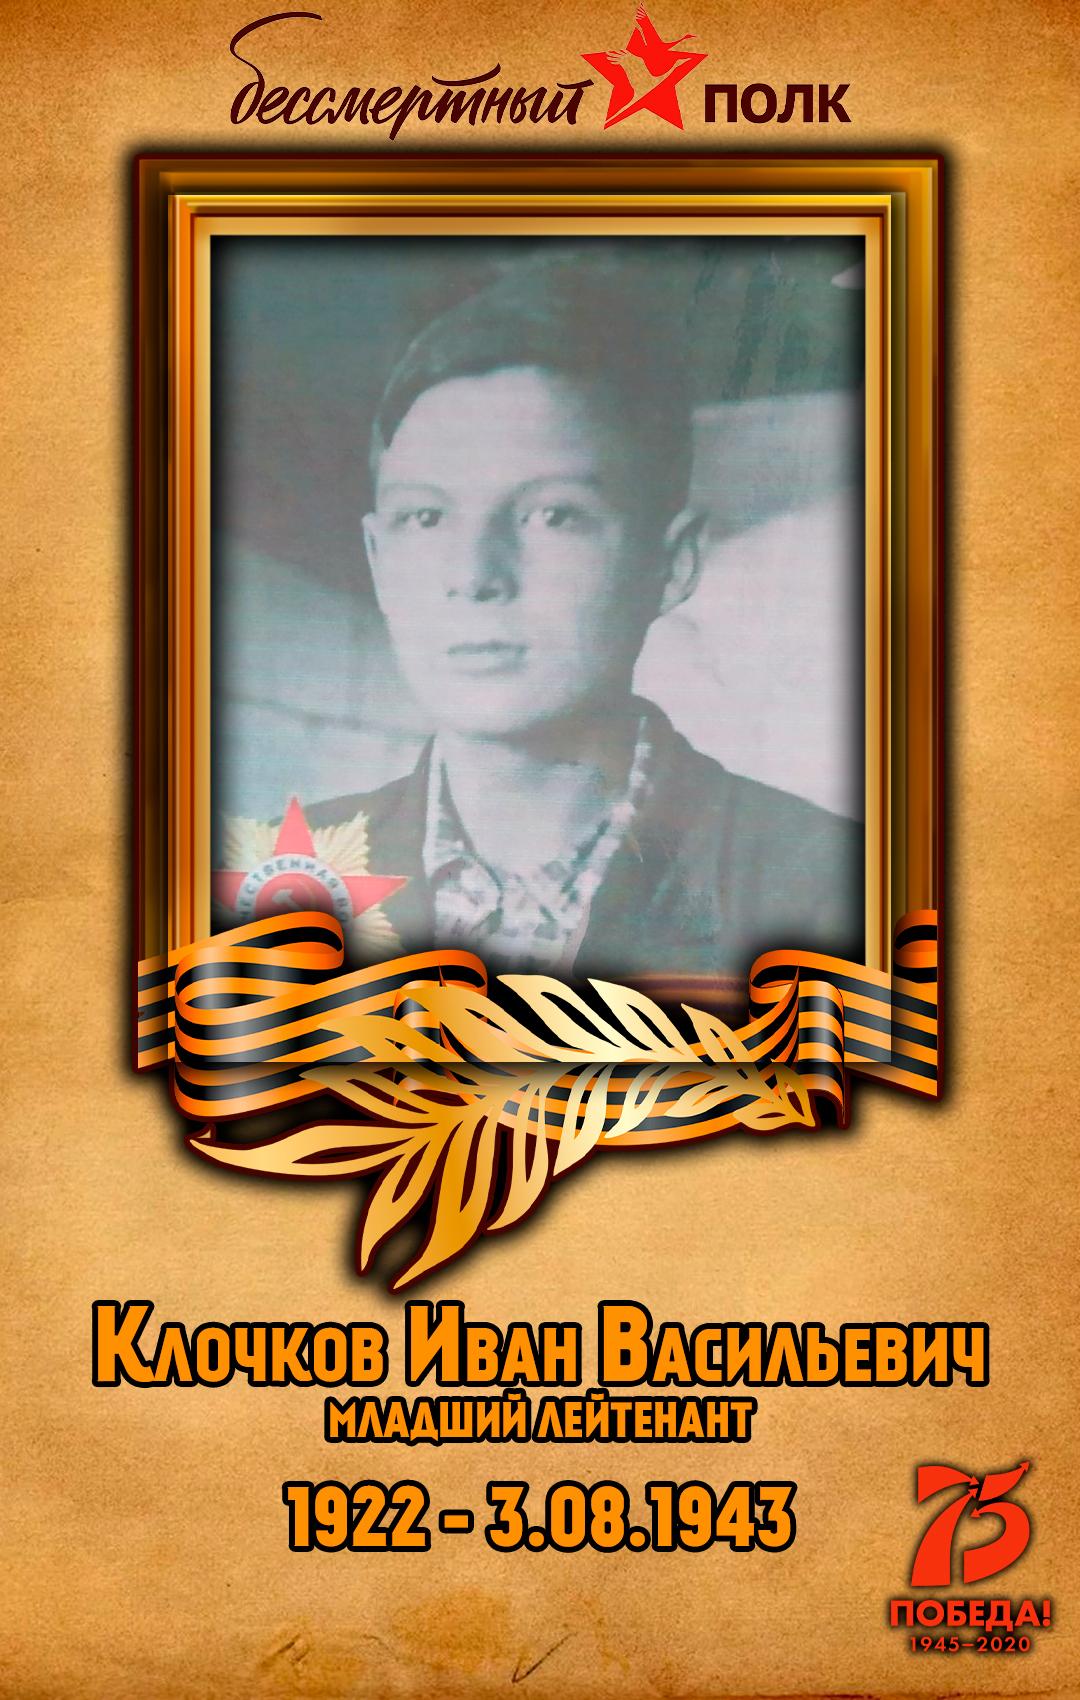 Клочков-Иван-Васильевич